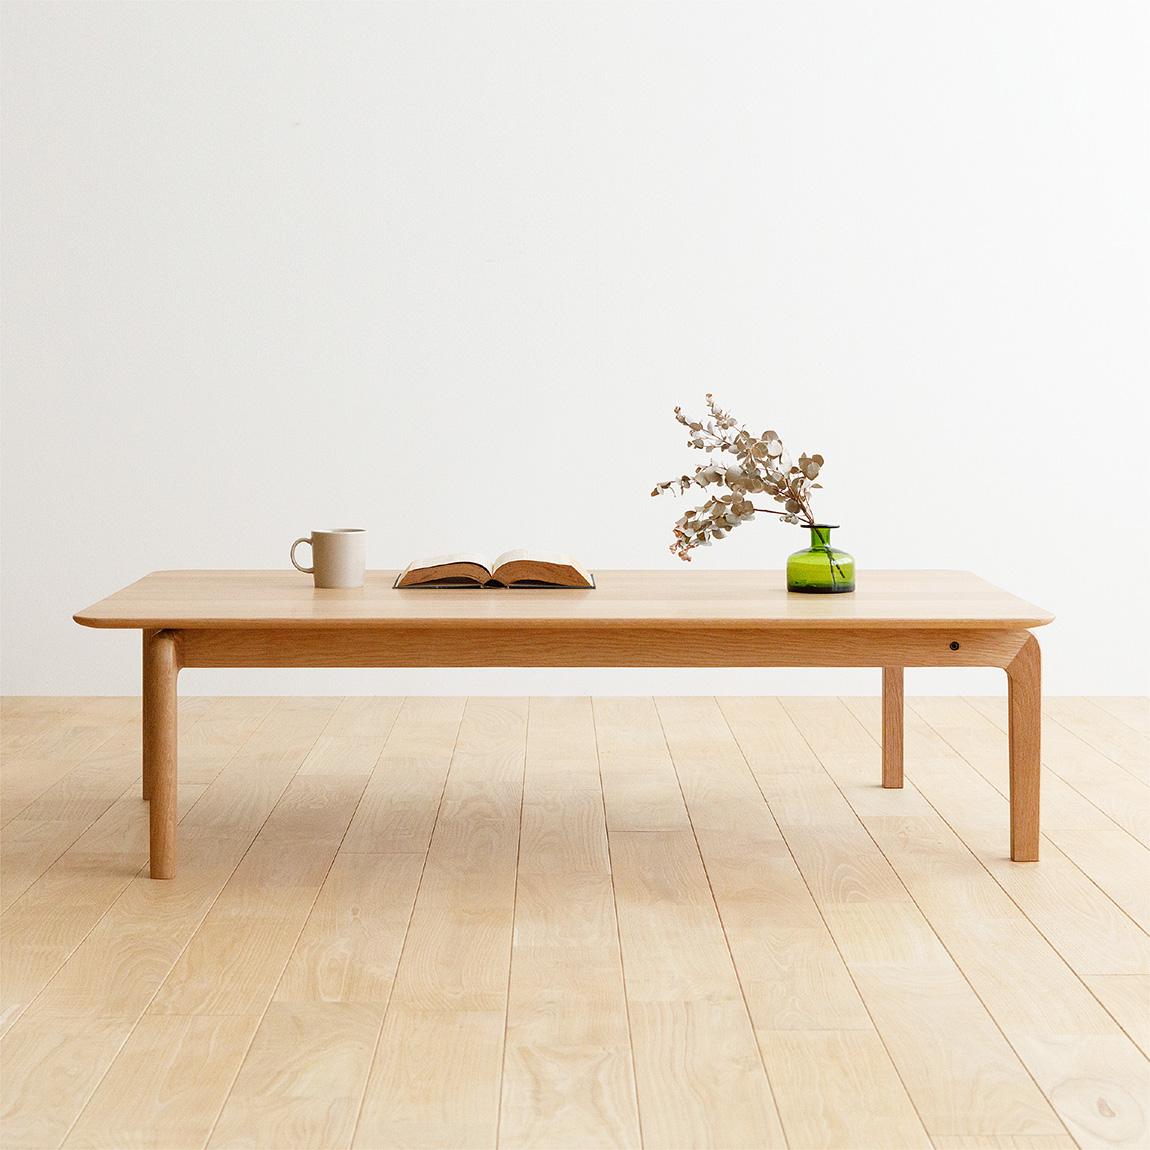 LISCIO Low Table 126*70 / oak